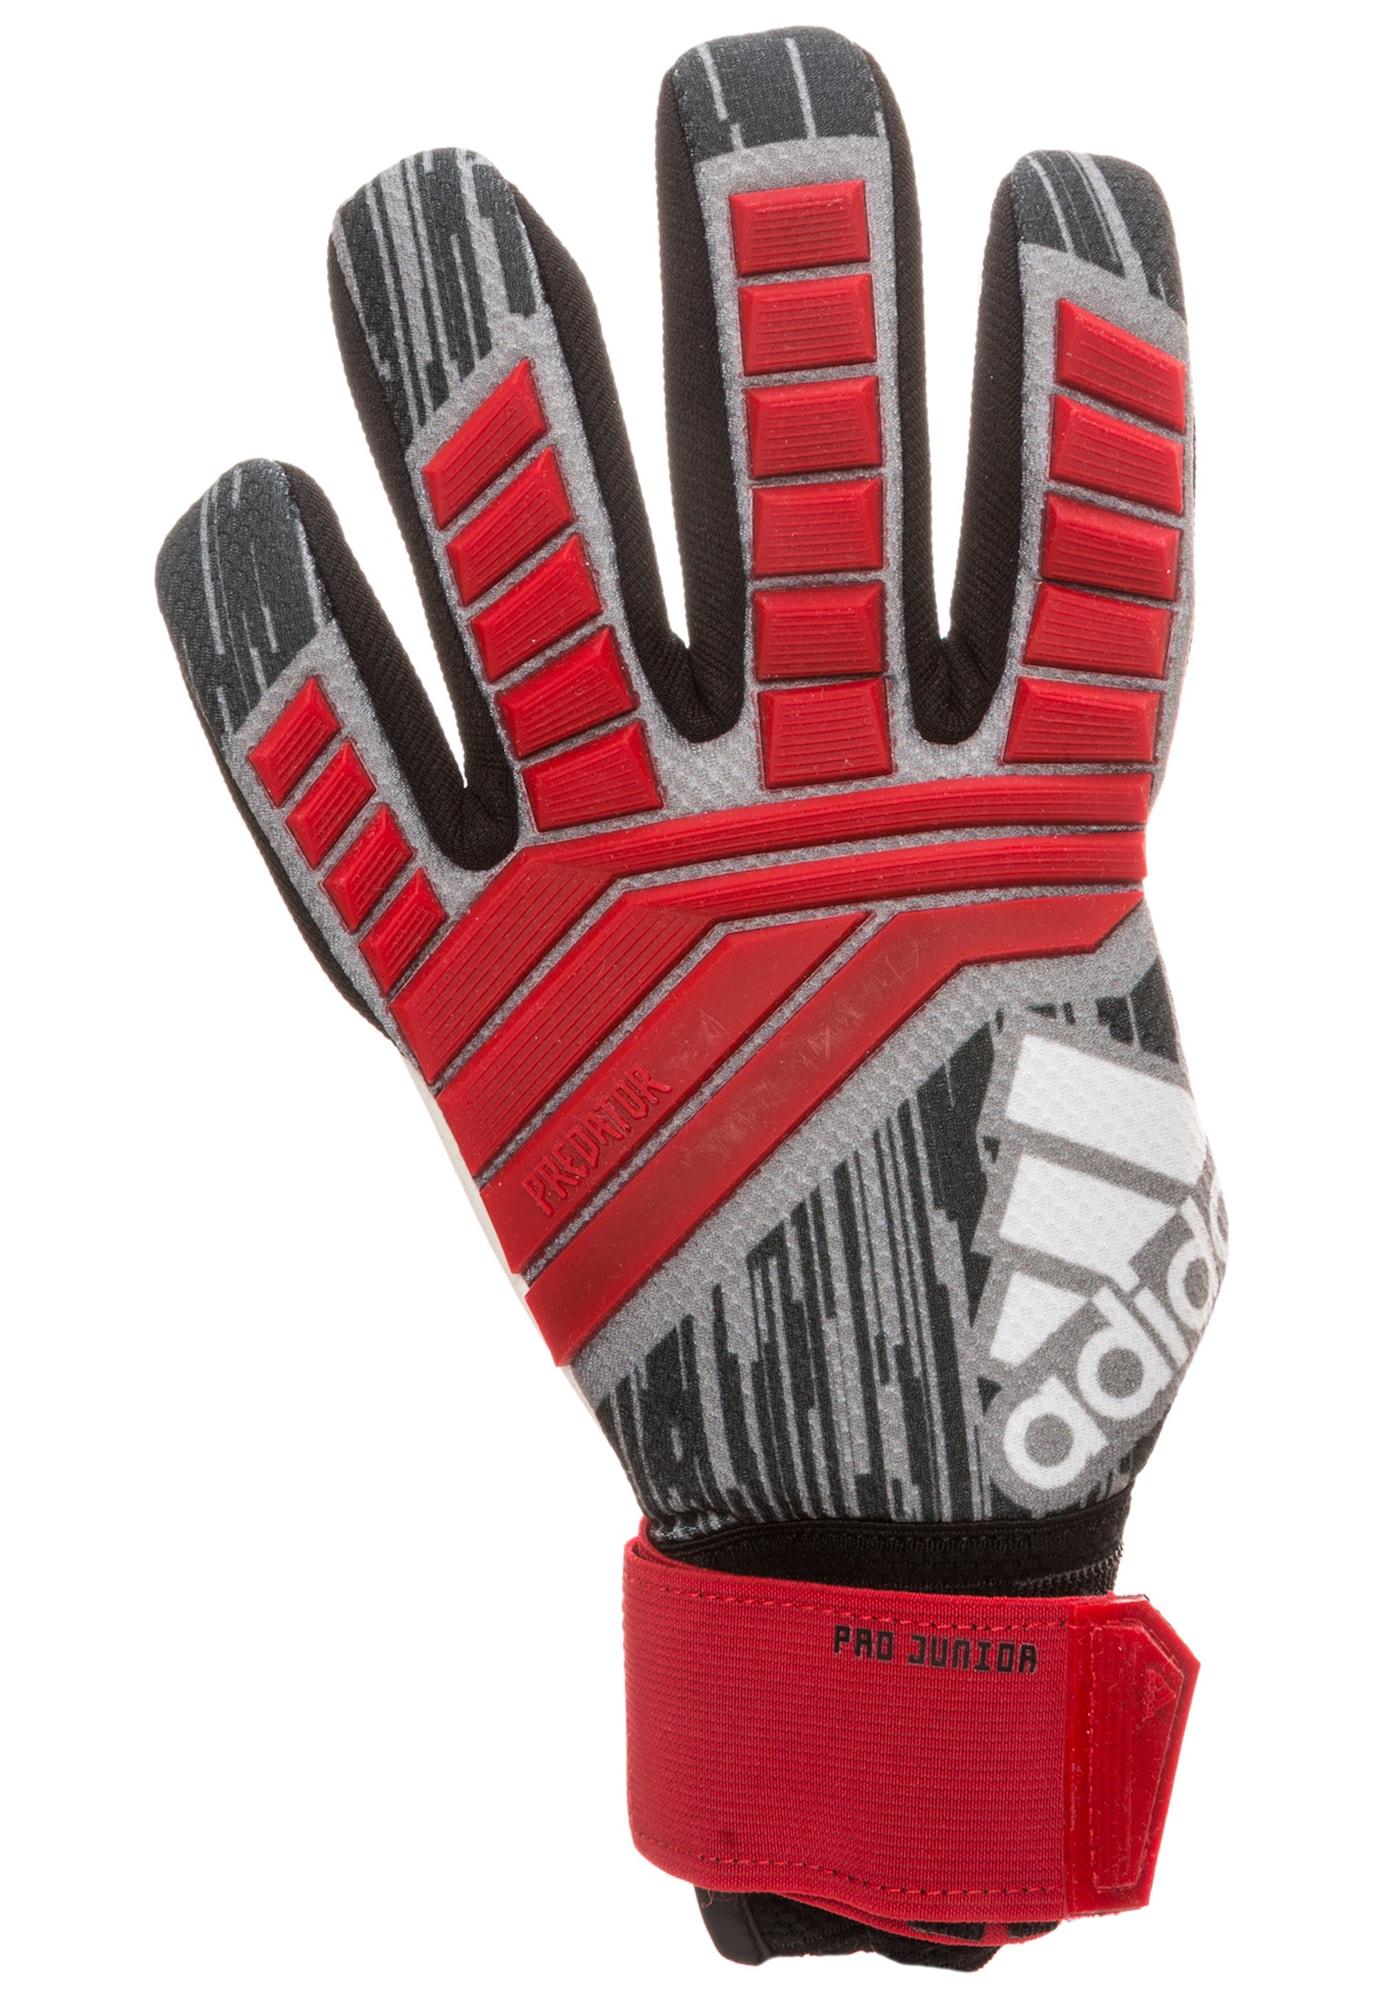 ADIDAS PERFORMANCE, Meisjes Sporthandschoenen 'Predator Pro', rood / zwart / wit